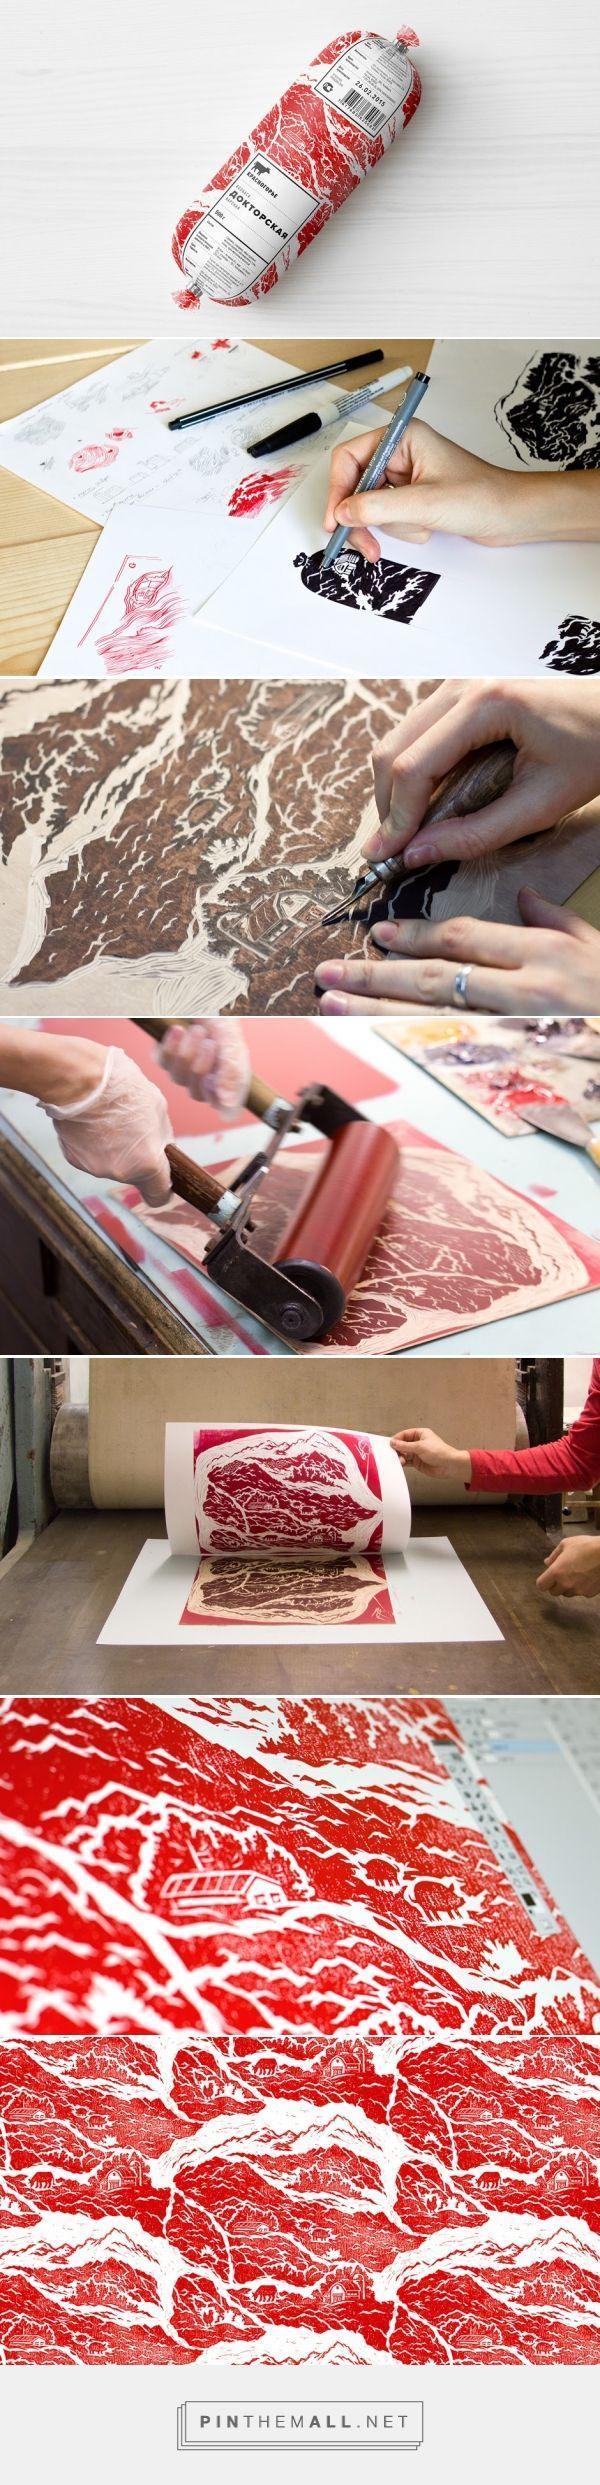 Krasnogorie - Packaging of the World - Creative Package Design Gallery